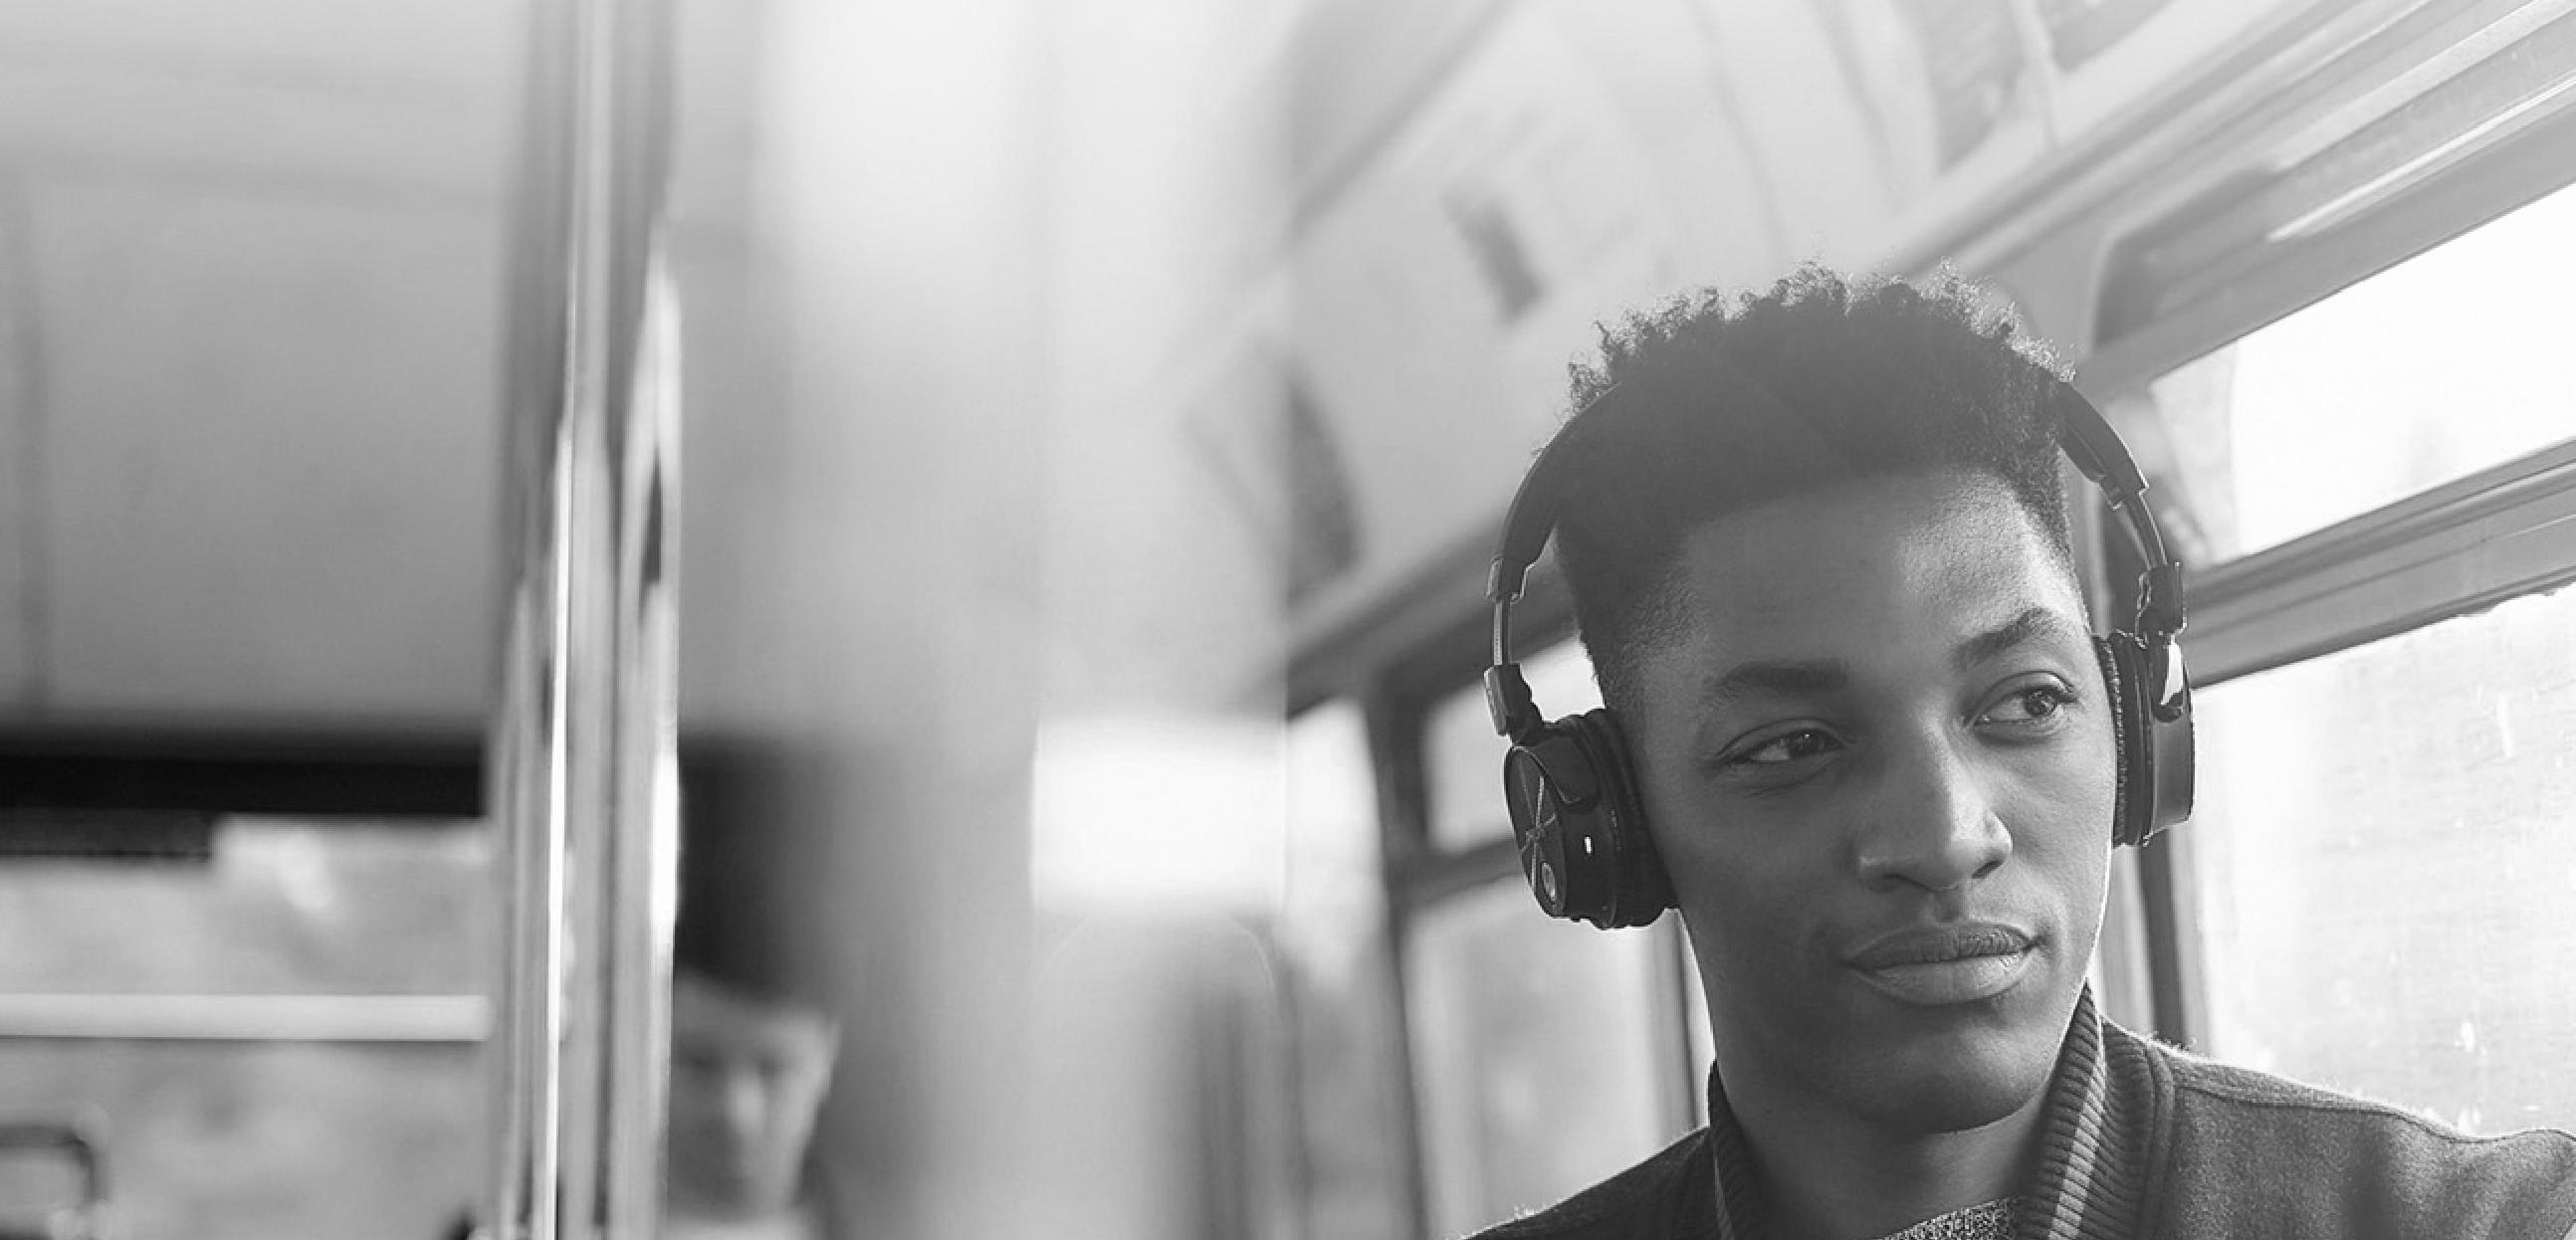 Man on London bus listening to digital audio through headphones